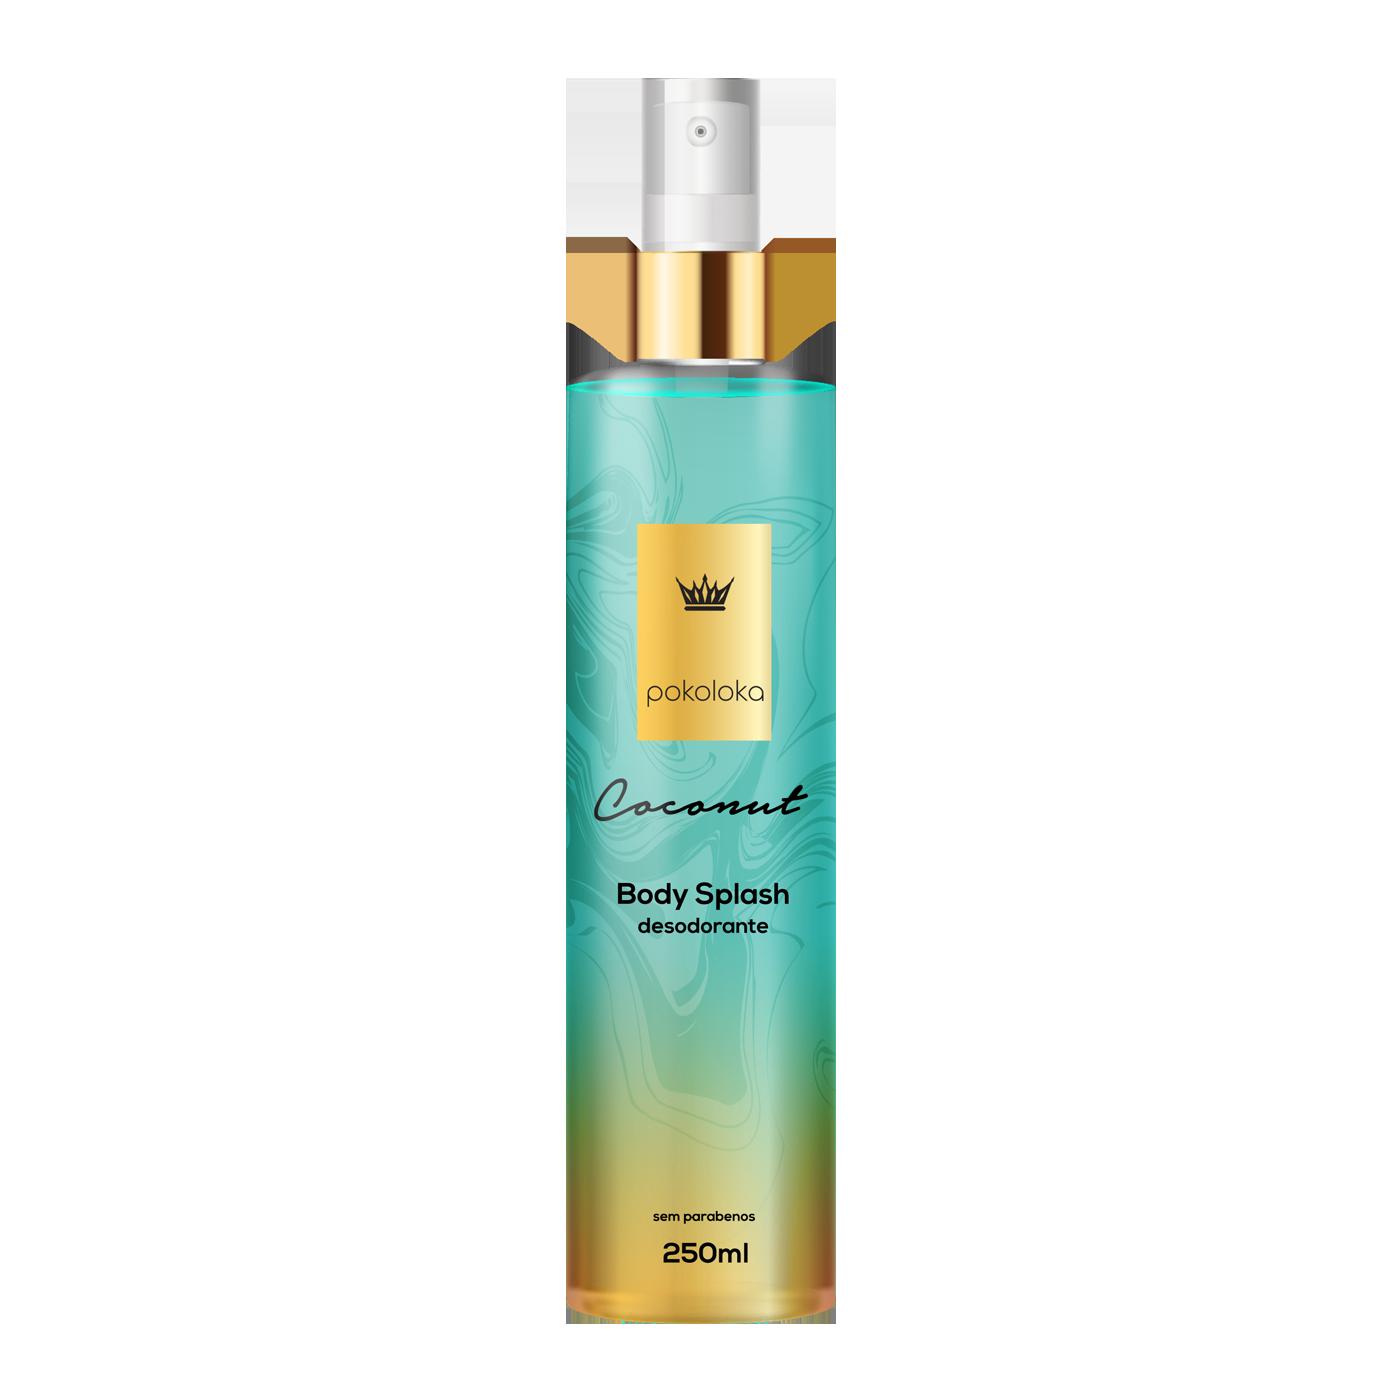 Body Splash Perfumado Coconut Pokaloka 250ml